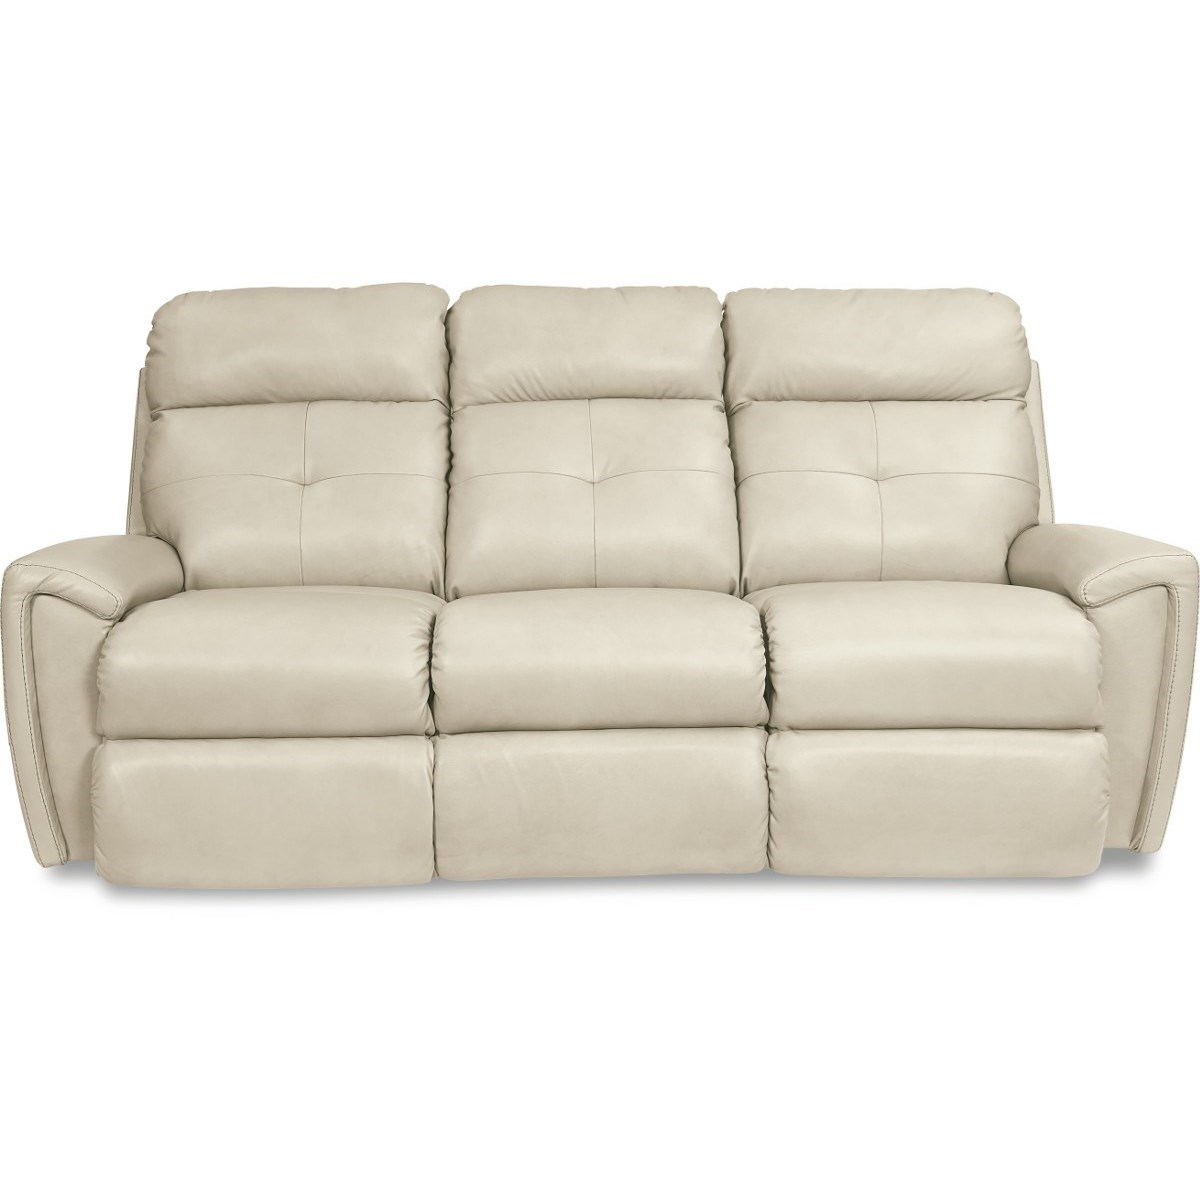 Douglas Reclining Sofa by La-Z-Boy at Houston's Yuma Furniture